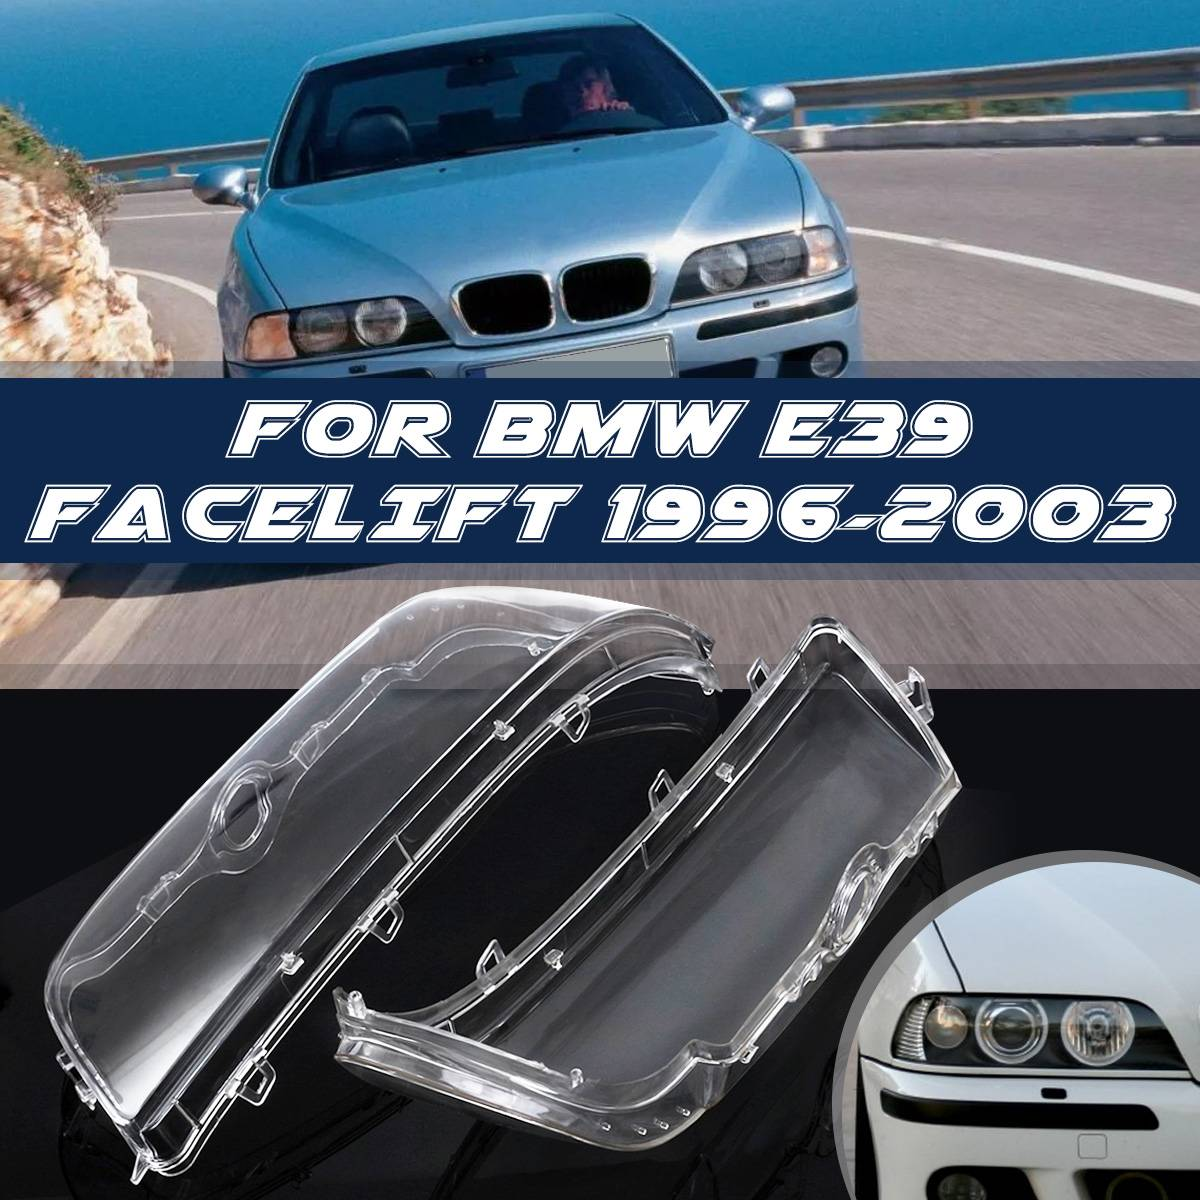 Headlight Case For BMW E39 1996-2003 Headlight Cover Shell Headlight Glass Lens Automobiles Headlamp Lense Kit High Quality